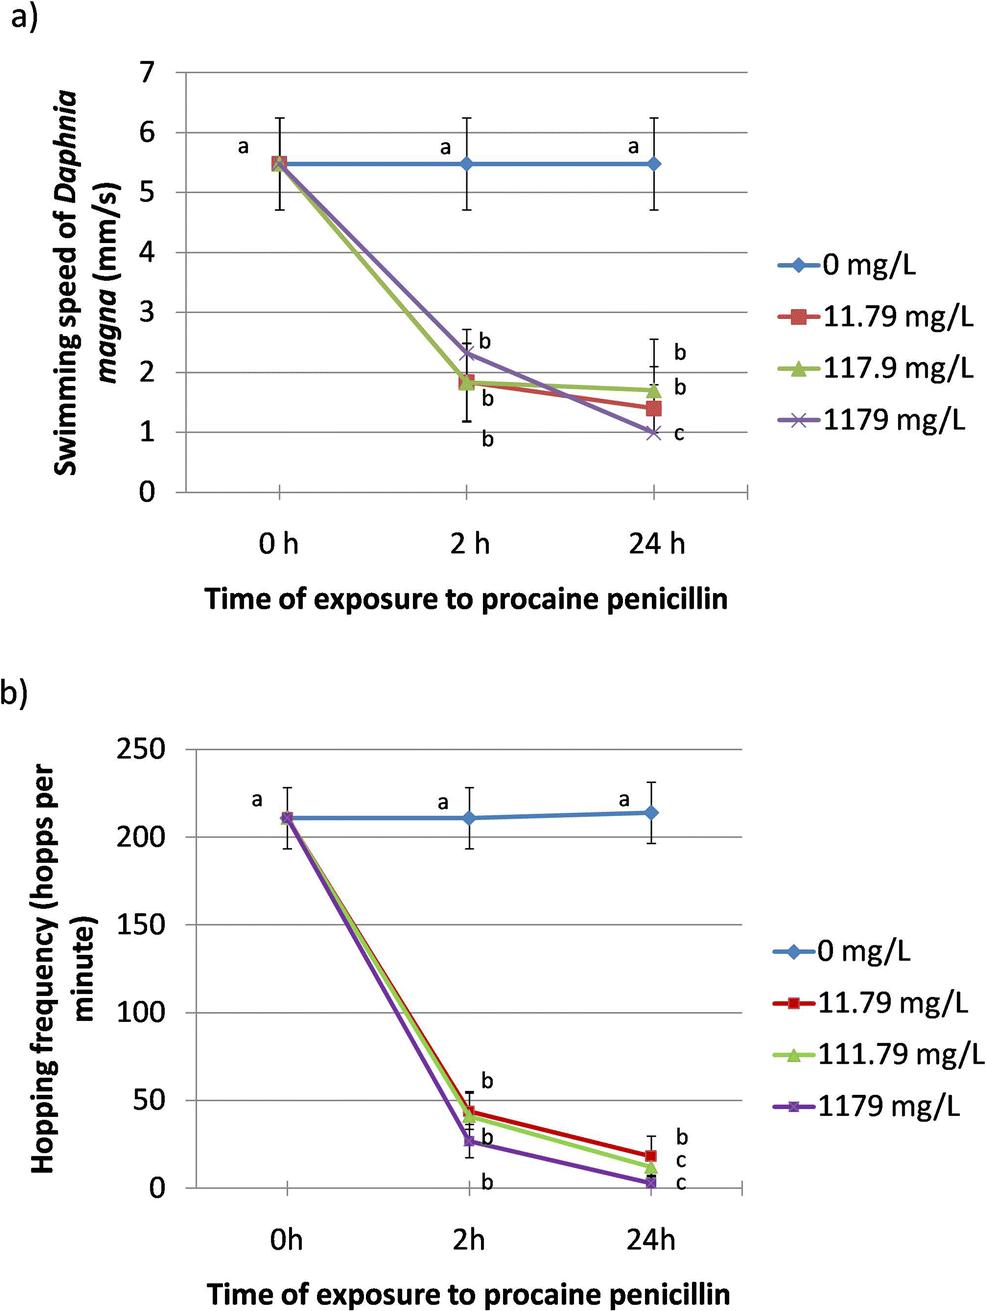 Procaine penicillin alters swimming behaviour and